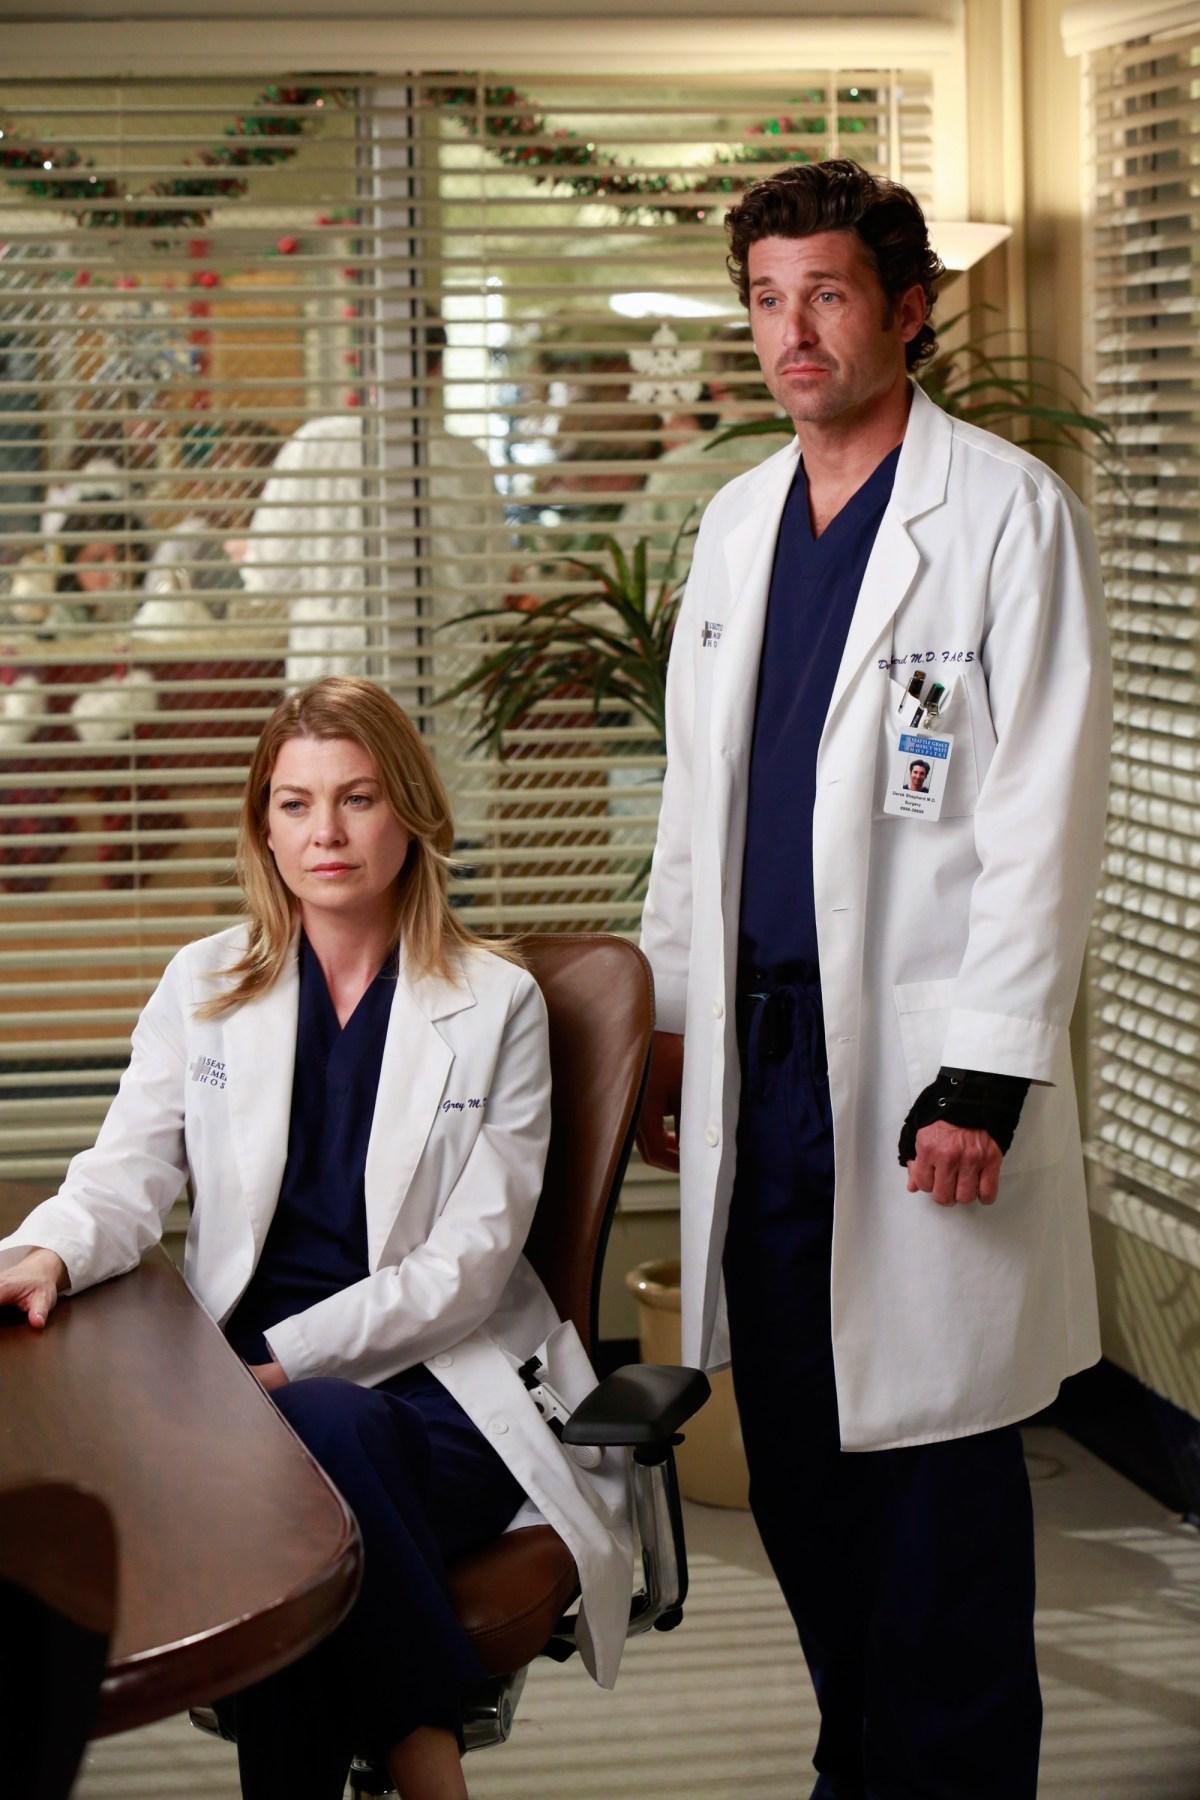 Greys Anatomy Behind The Scenes Drama Through The Years